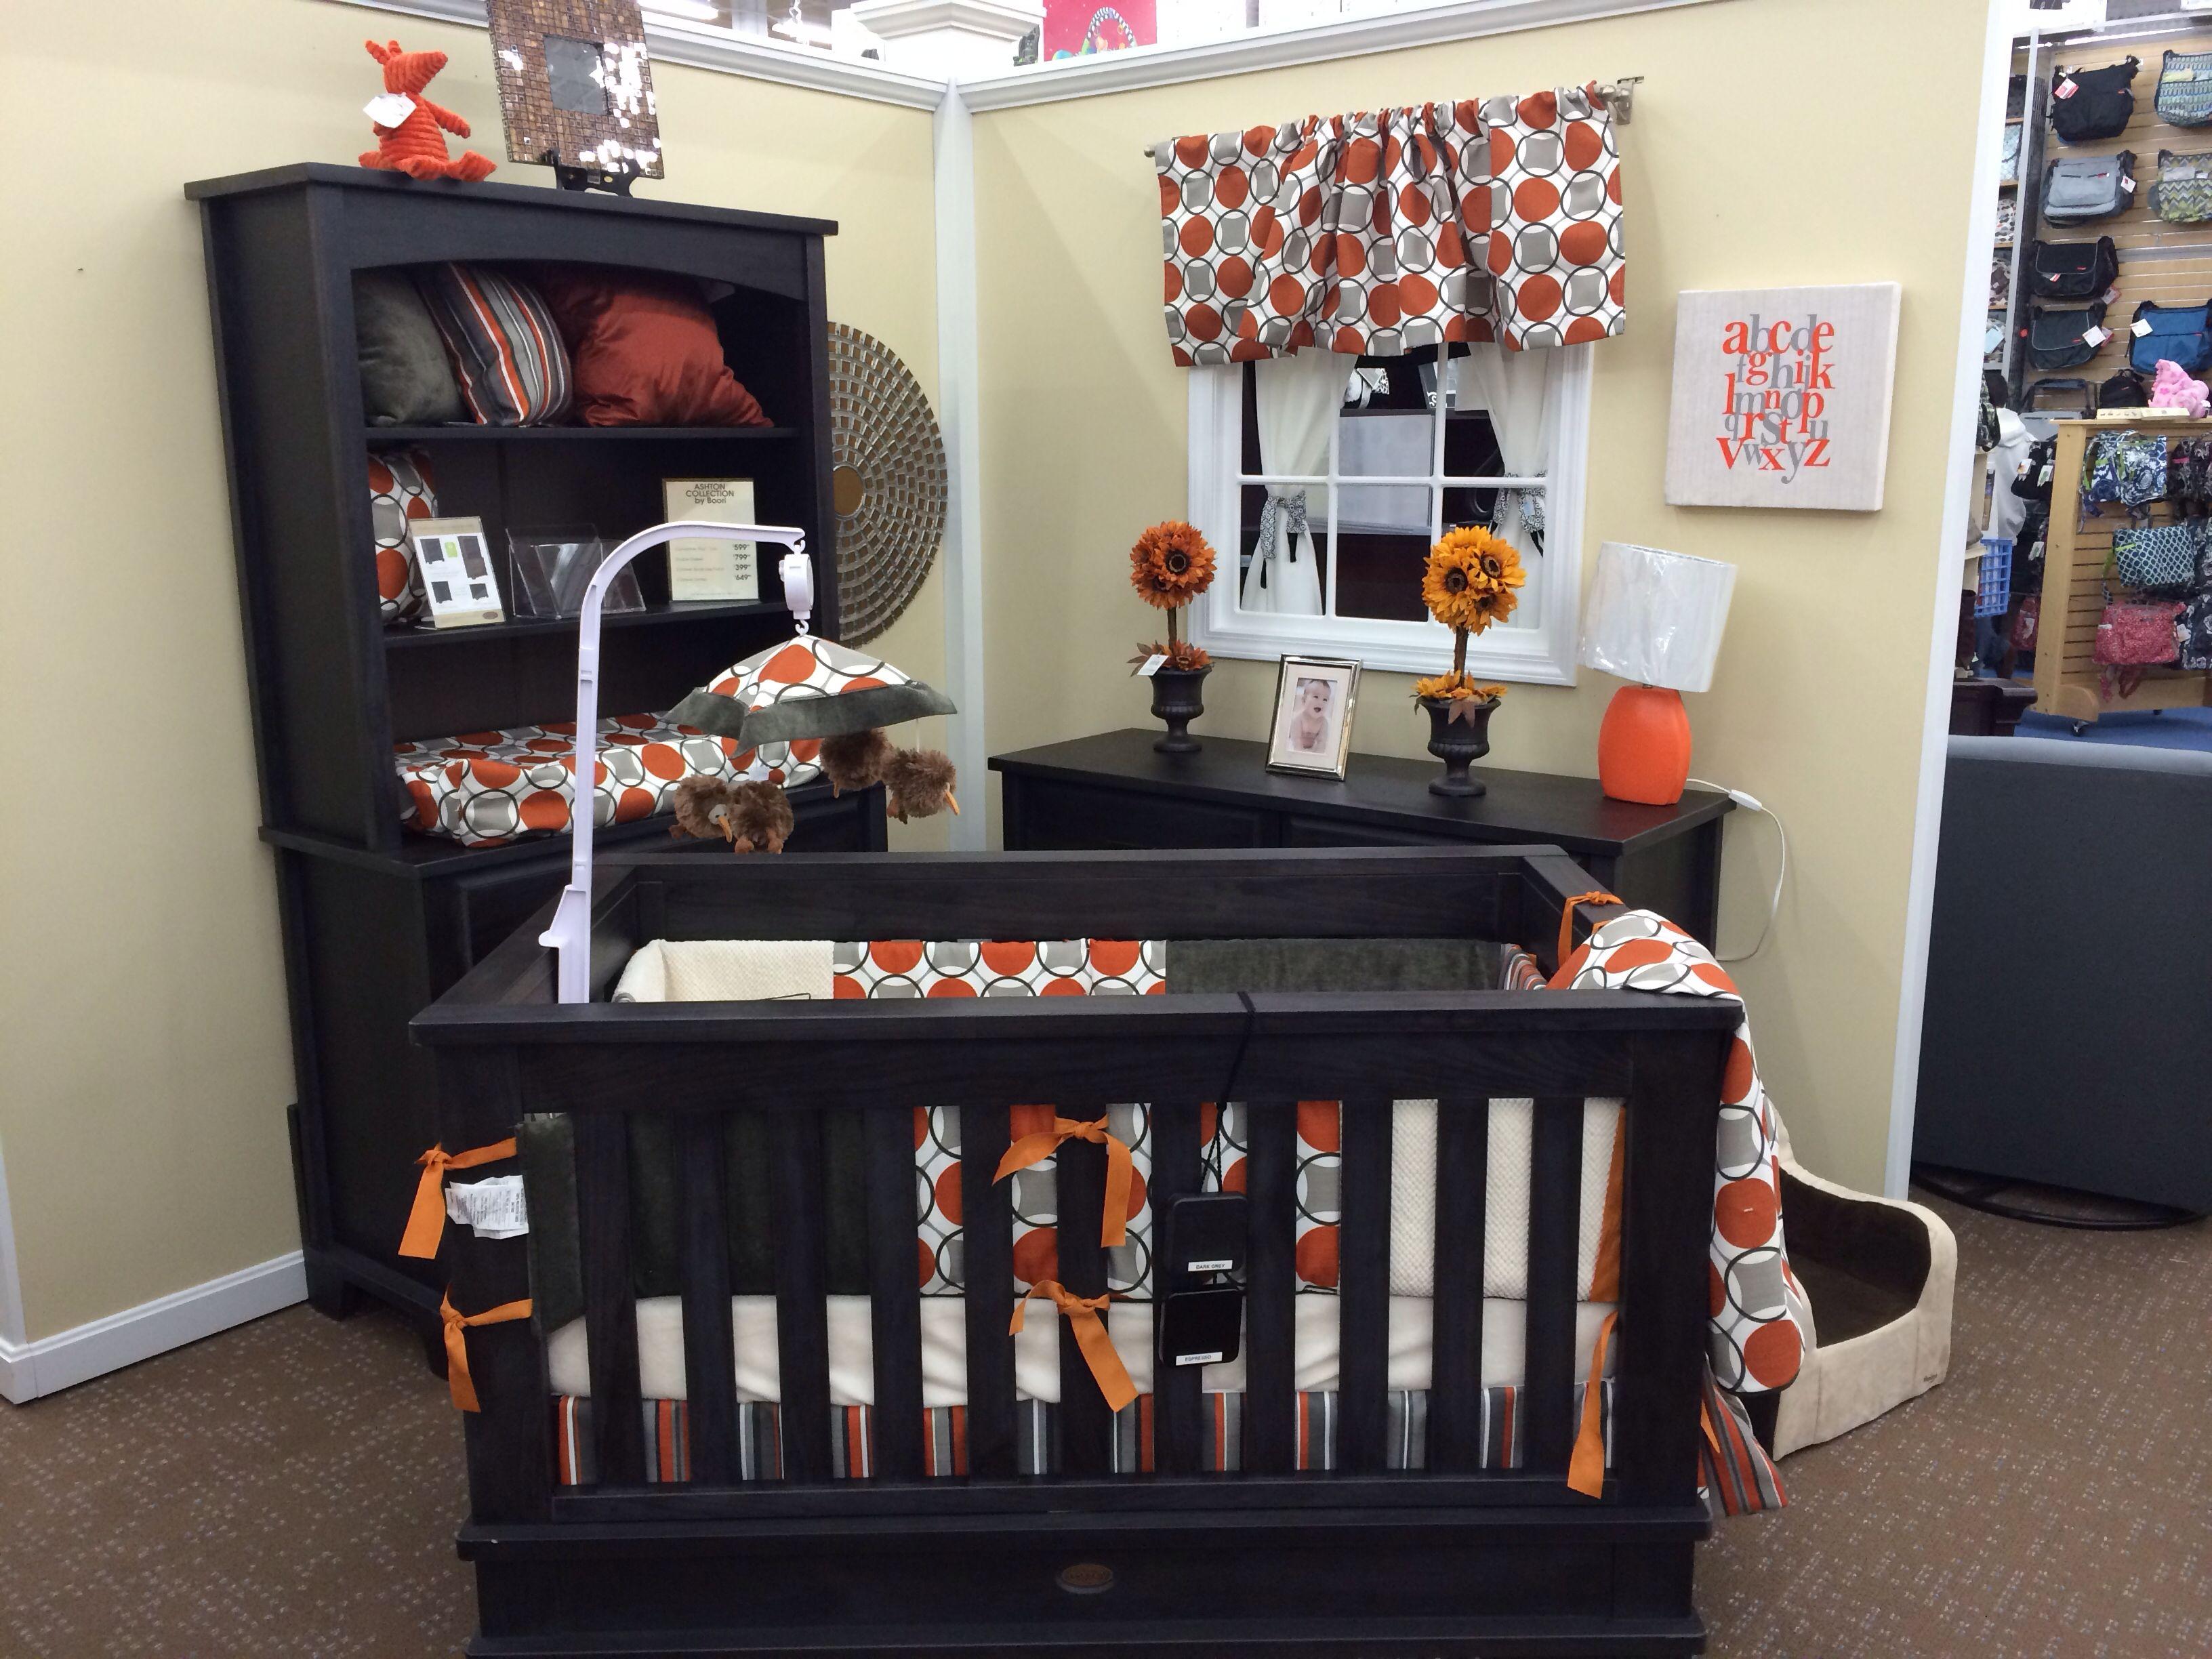 Baby cribs buy buy baby - Option For Crib Boori Ashton Convertible Rail Included At Buy Buy Baby